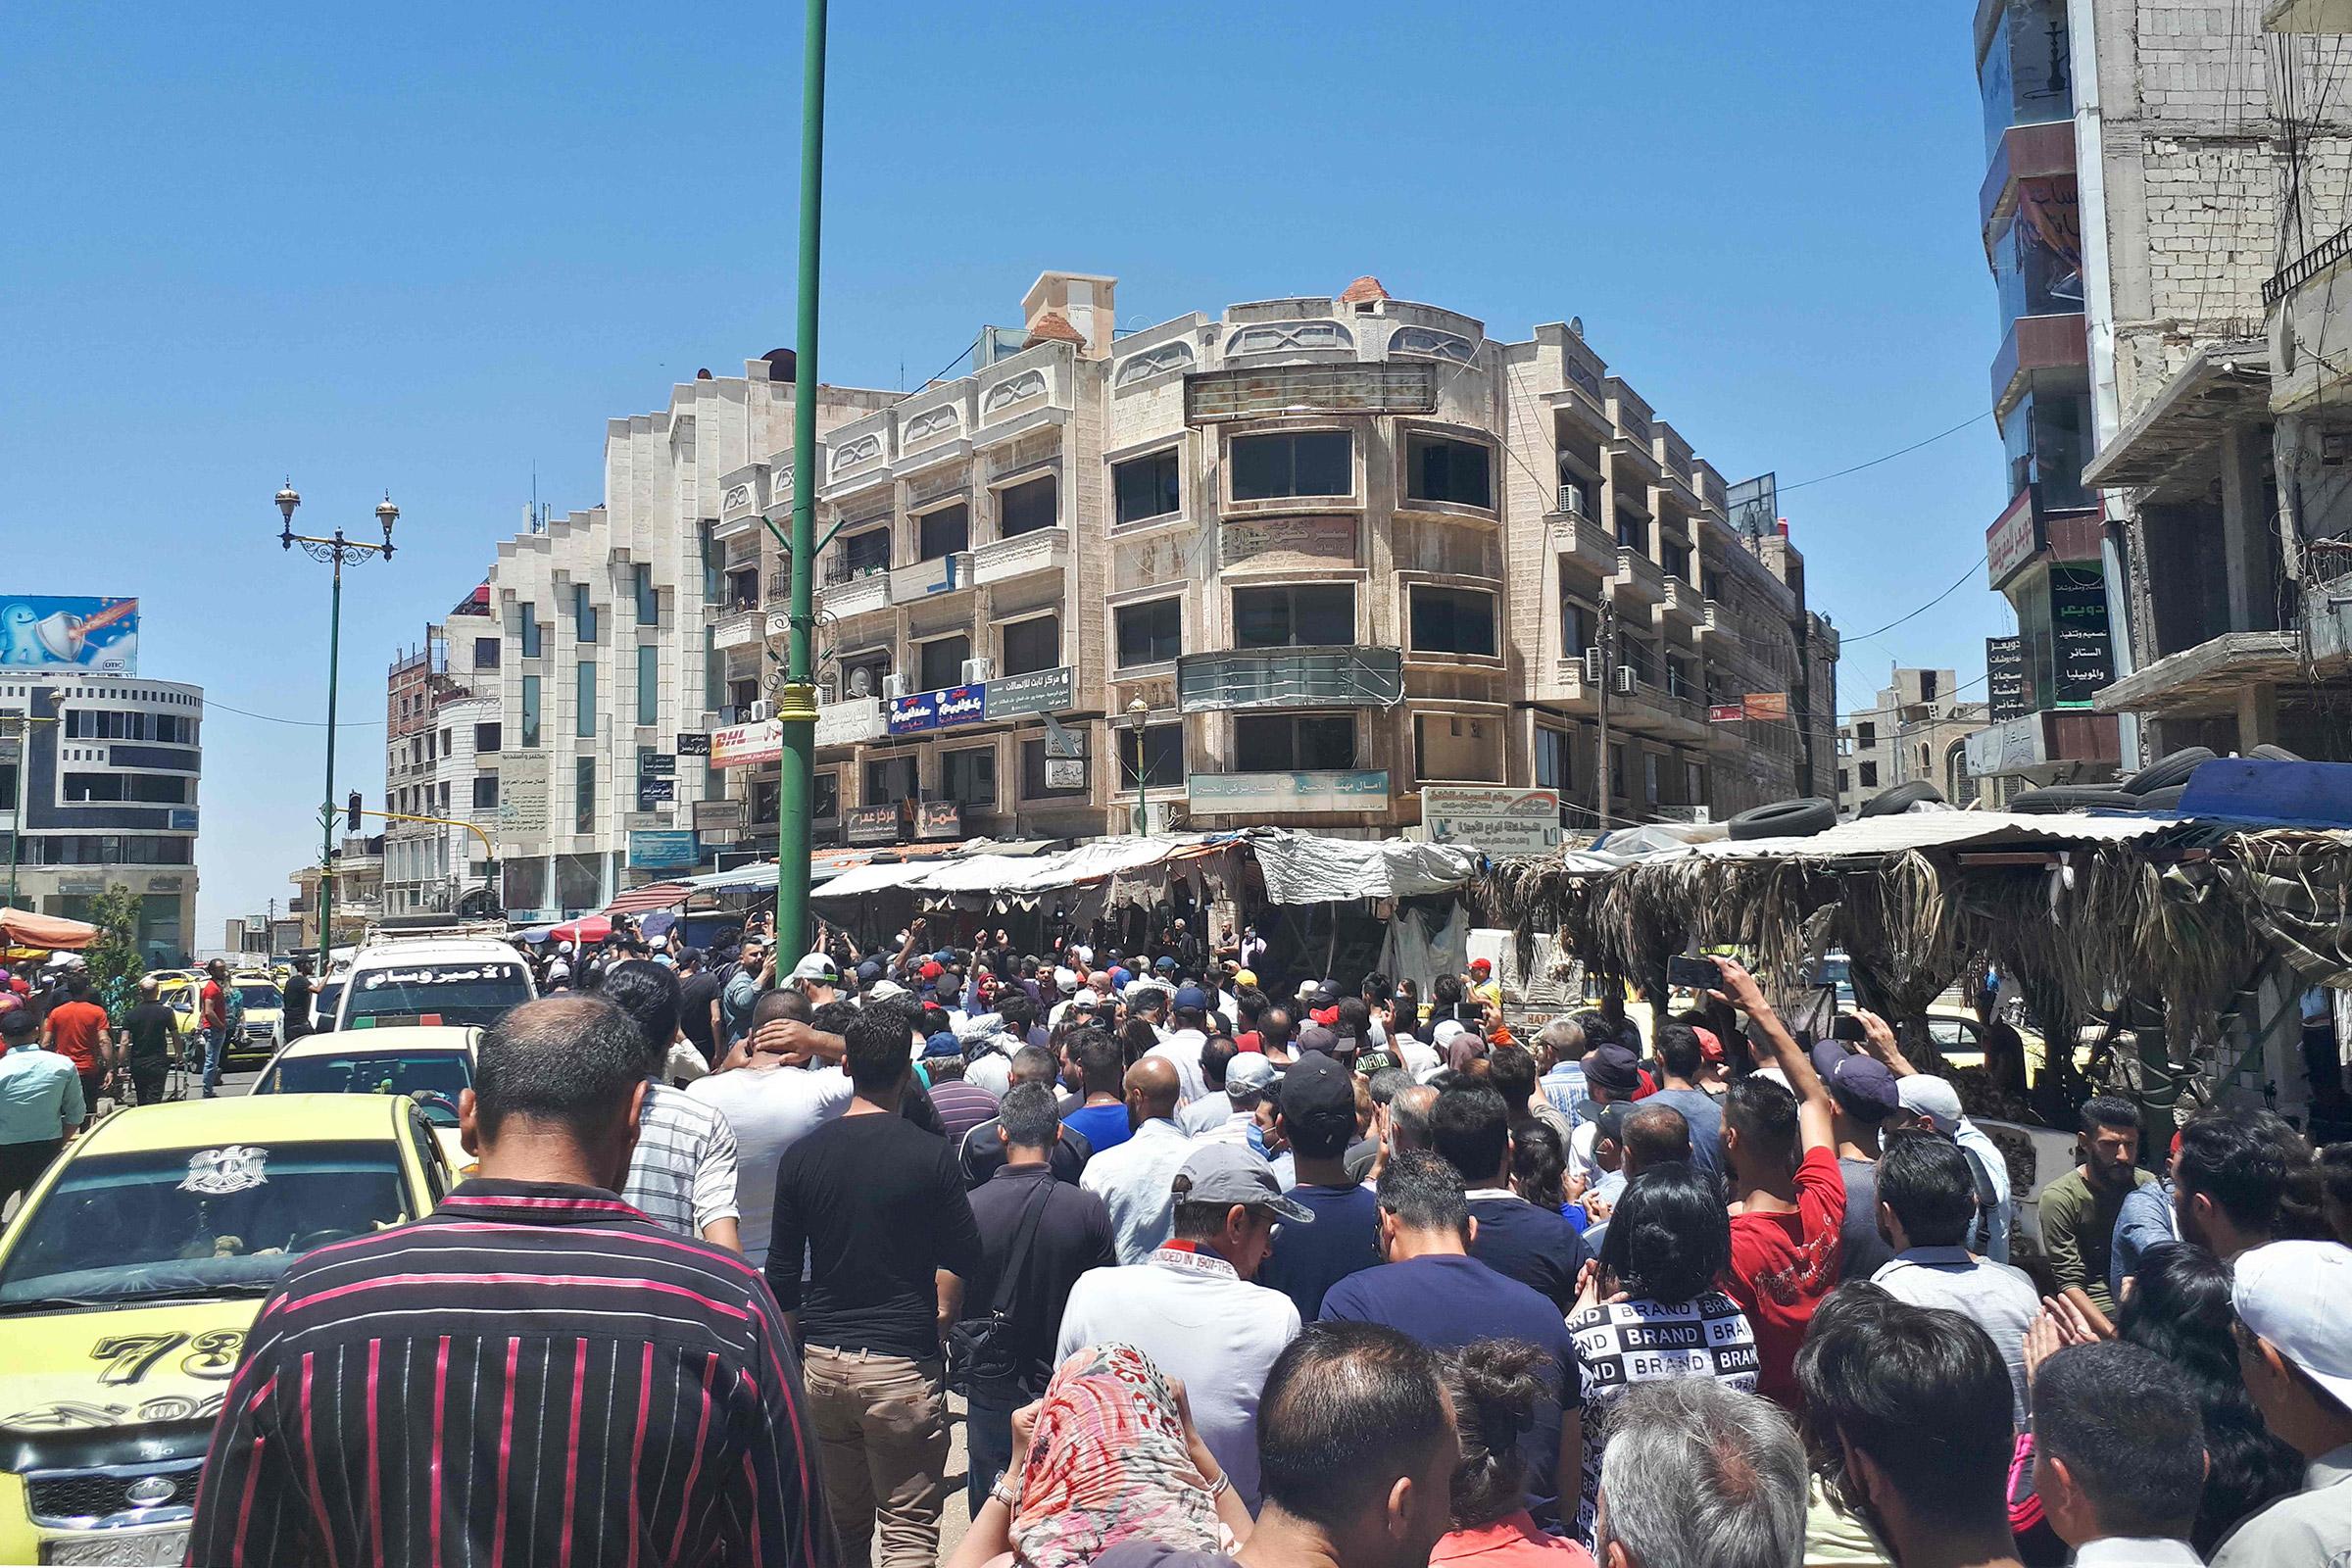 Protestors chant anti-government slogans in Suwaida, Syria on June 9, 2020.